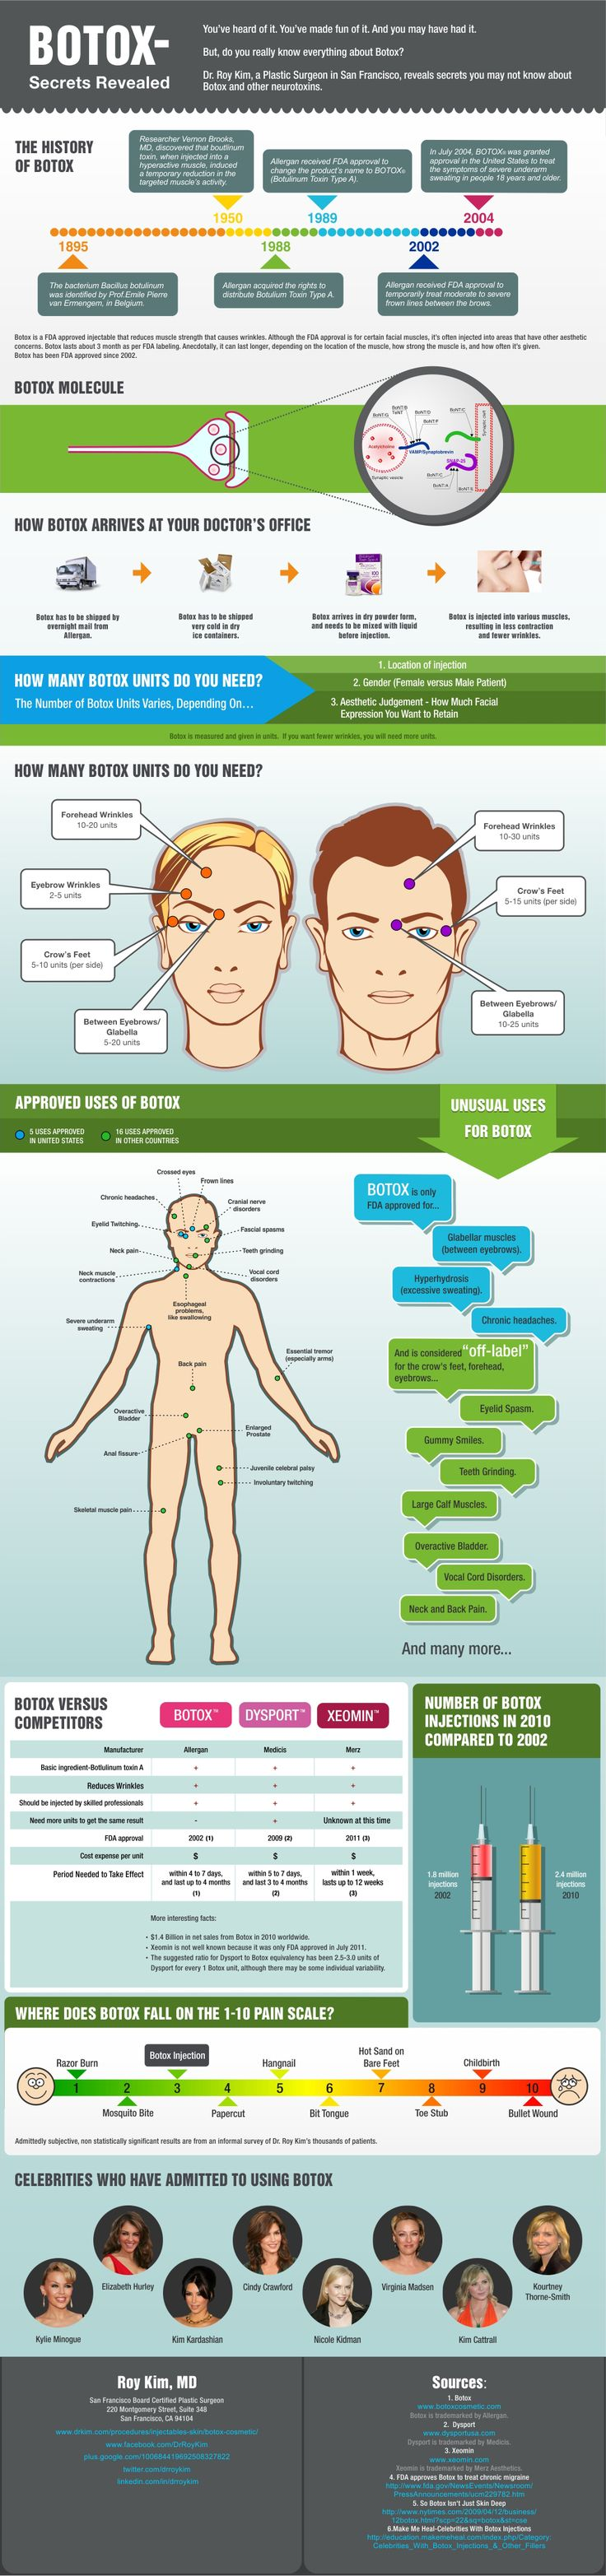 Botox infographic #botox#antiaging  www.creativeimagelasersolutions.com